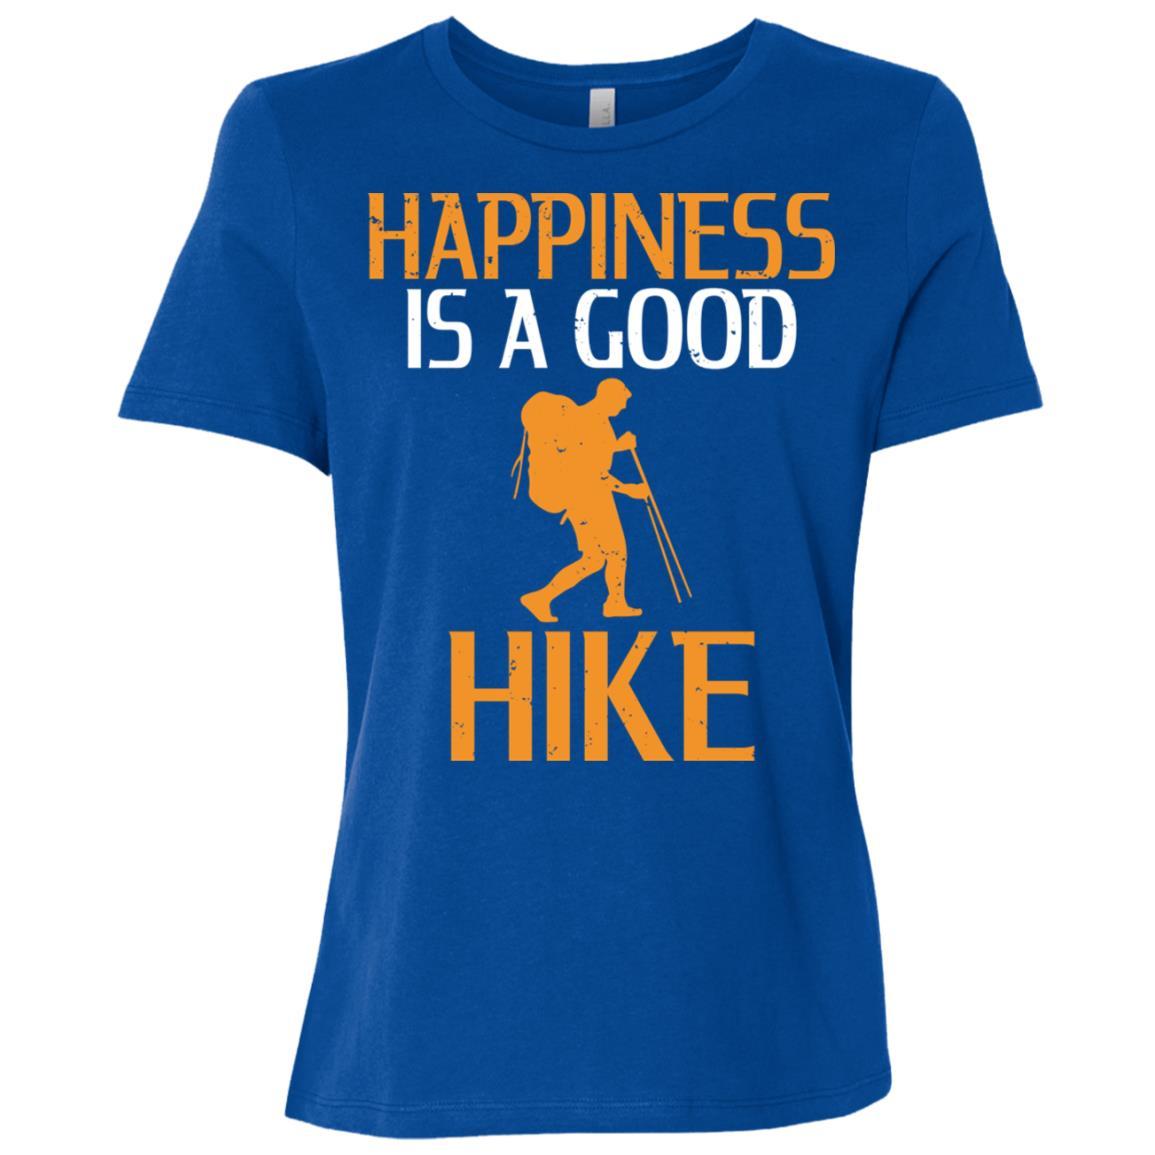 Happiness Is A Good Hike Women Short Sleeve T-Shirt